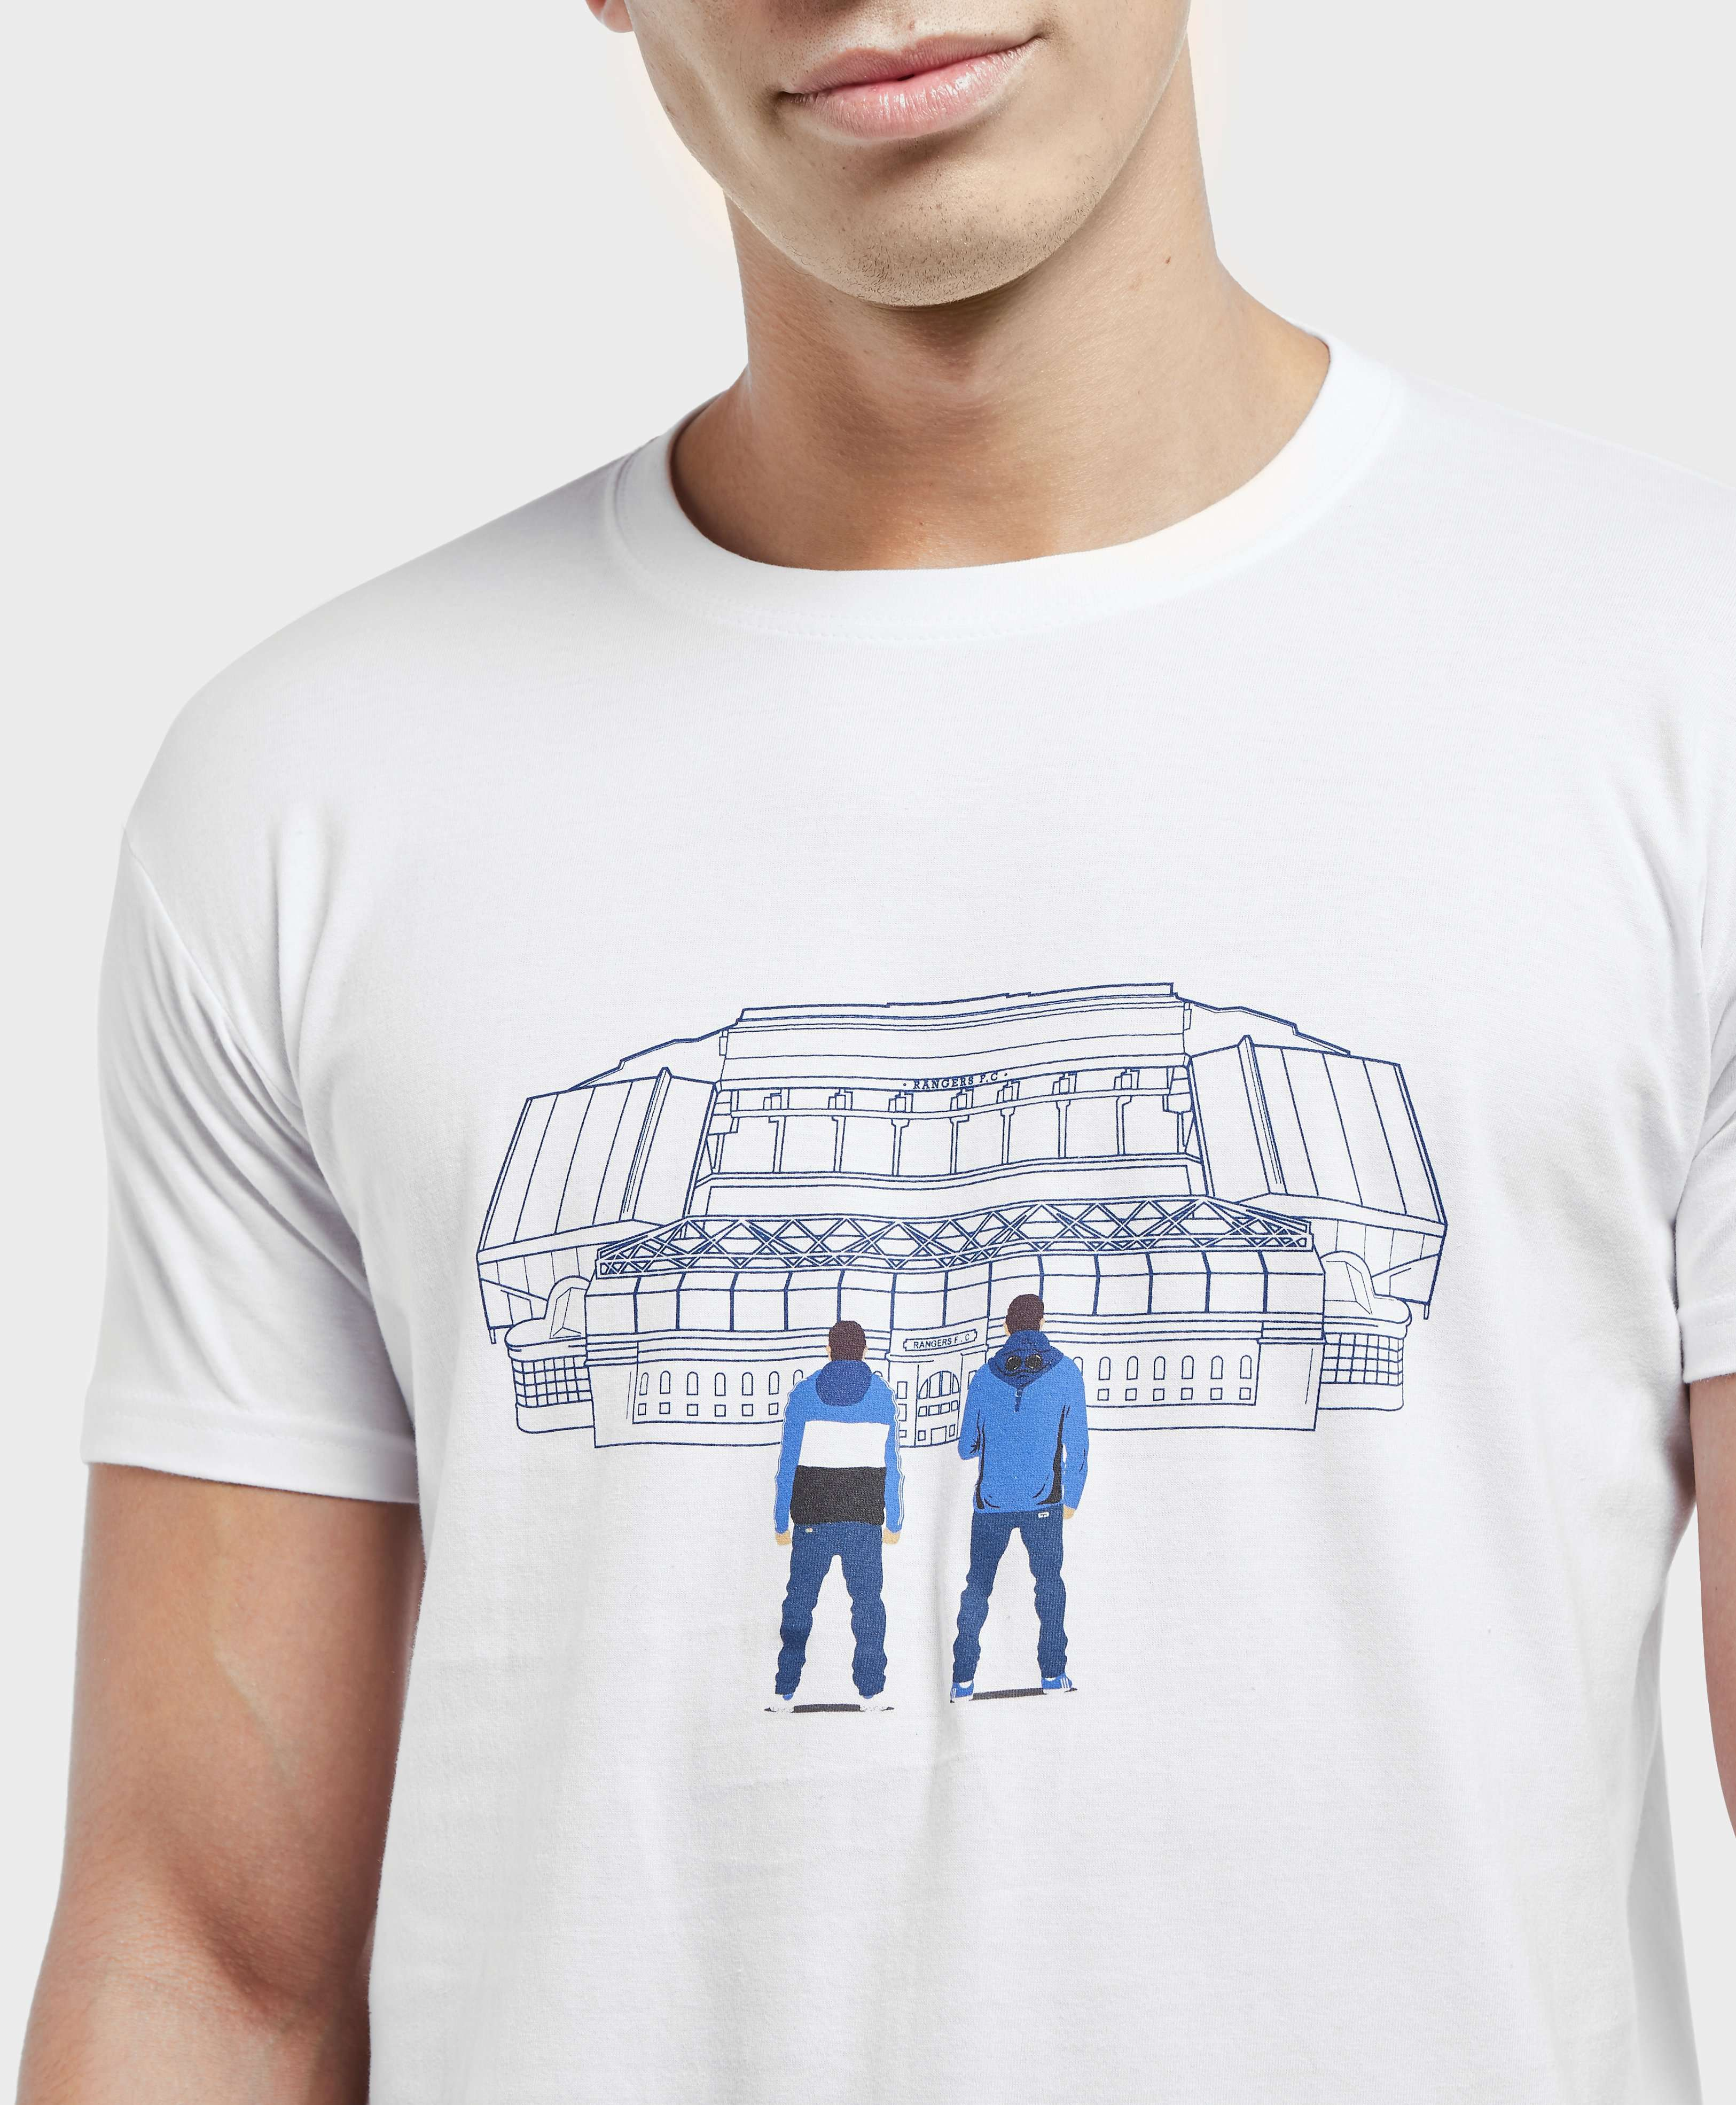 80s Casuals Rangers Stadium Short Sleeve T-Shirt